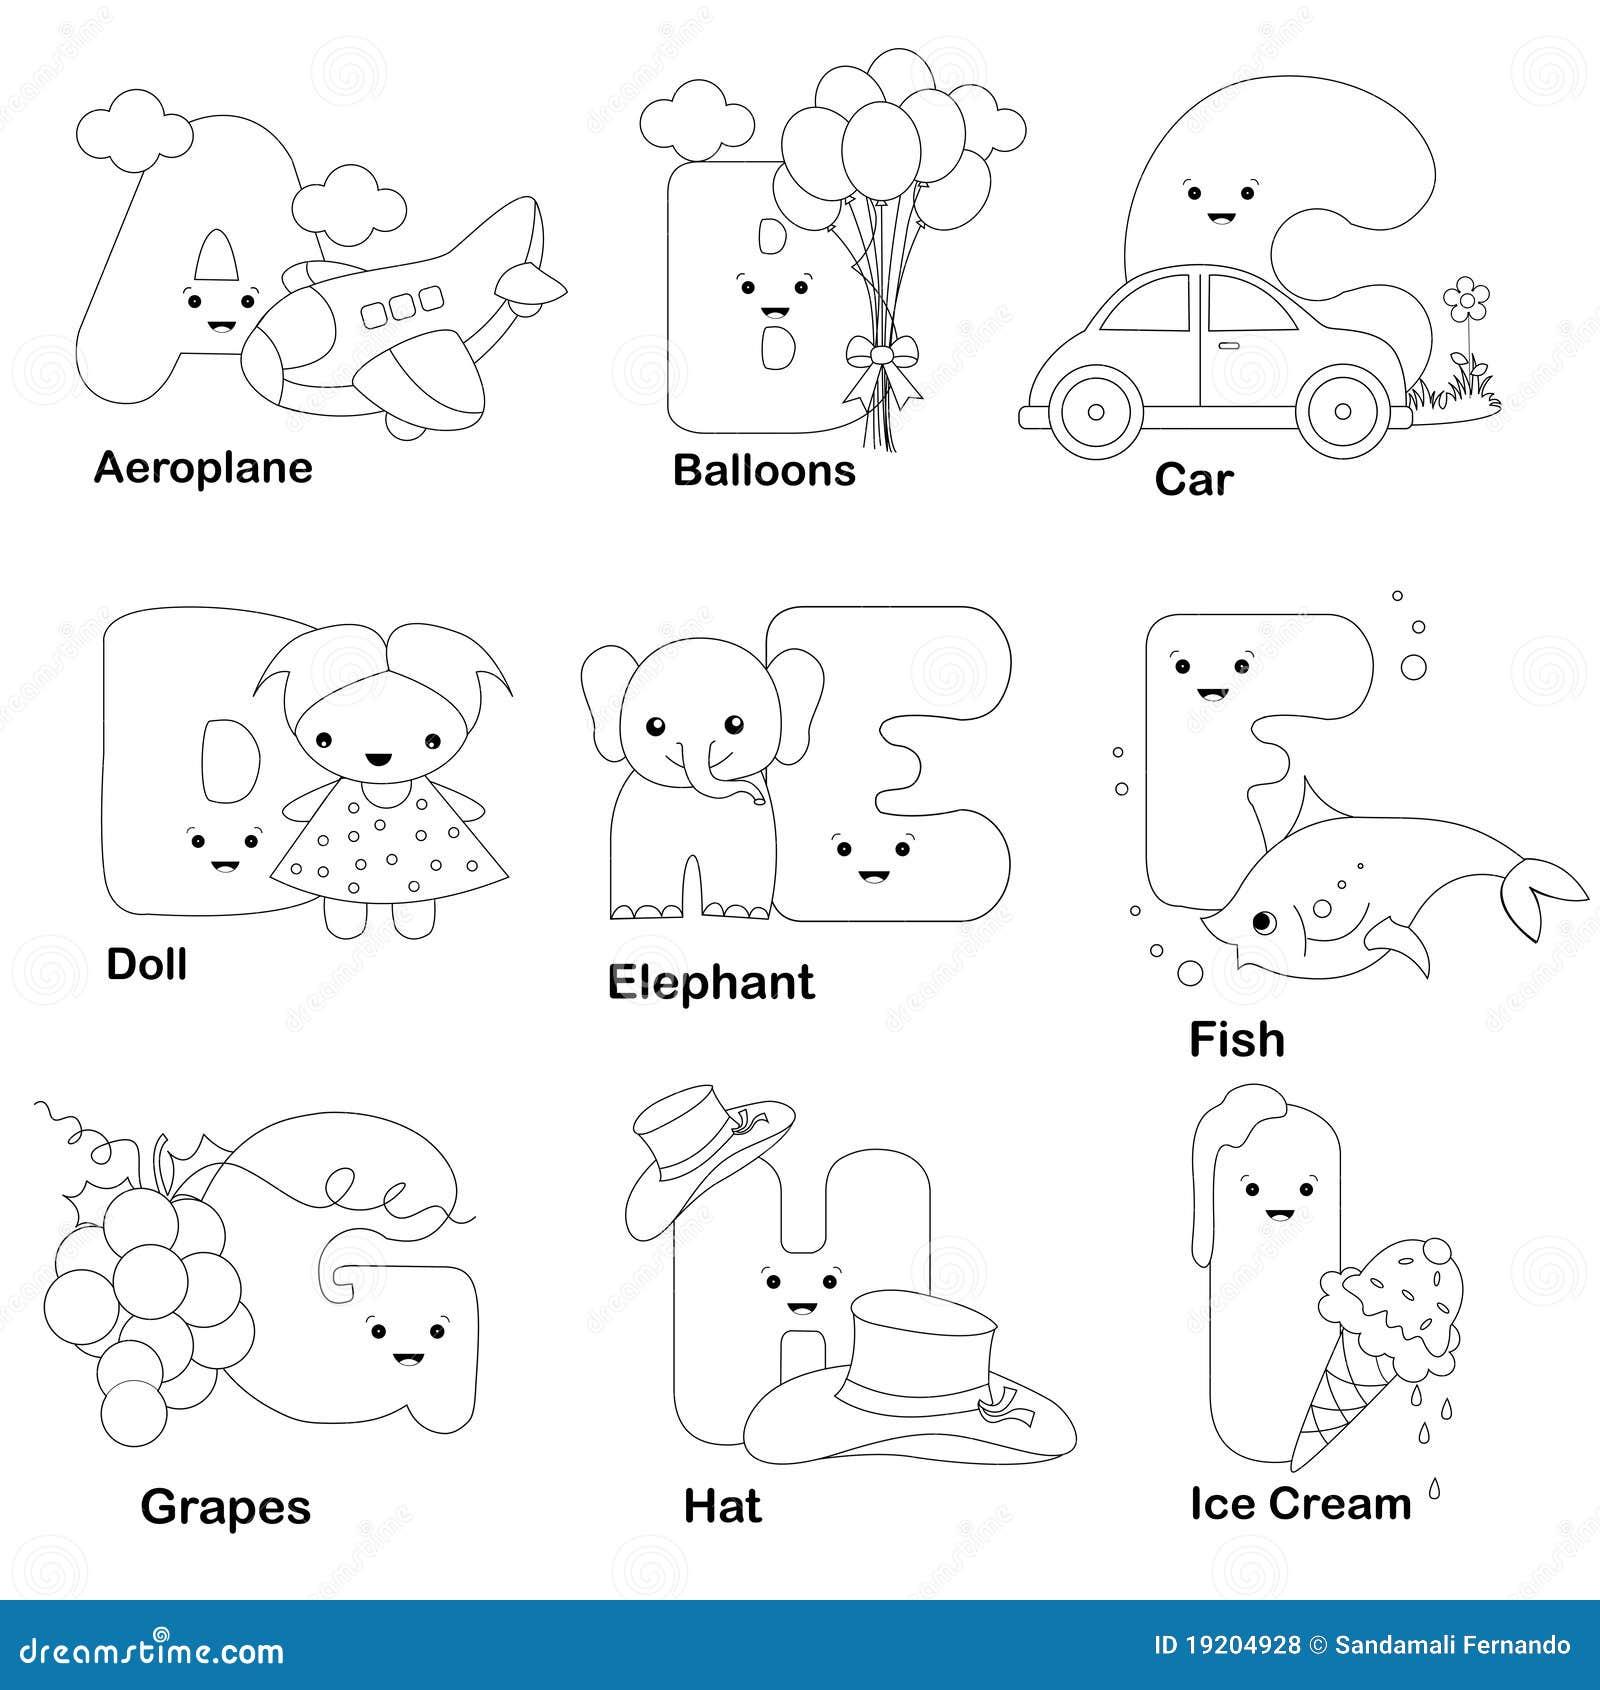 Alphabet coloring games online - Alphabet Z Coloring Pages